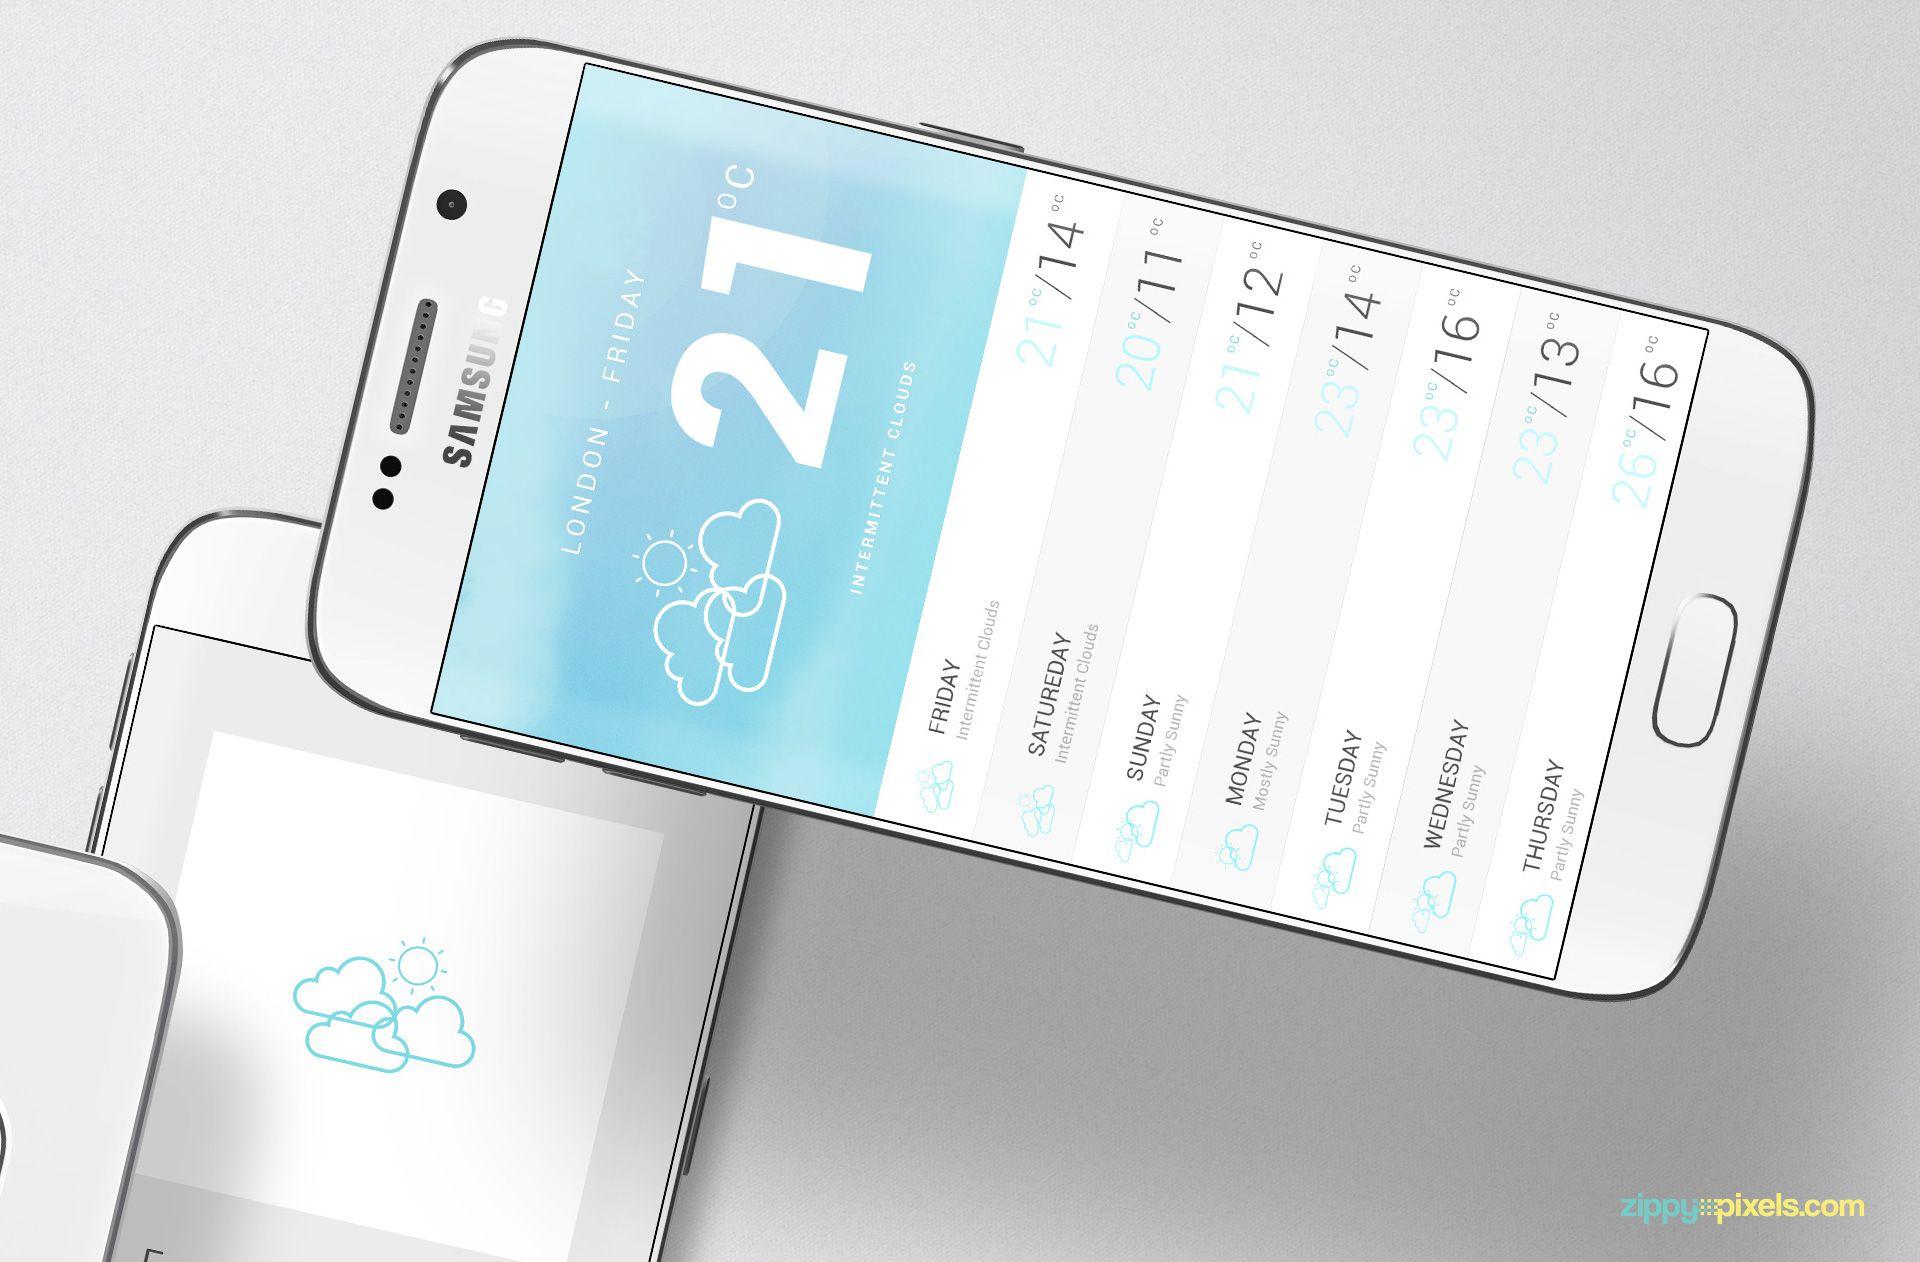 Free Android App Mockup | ZippyPixels